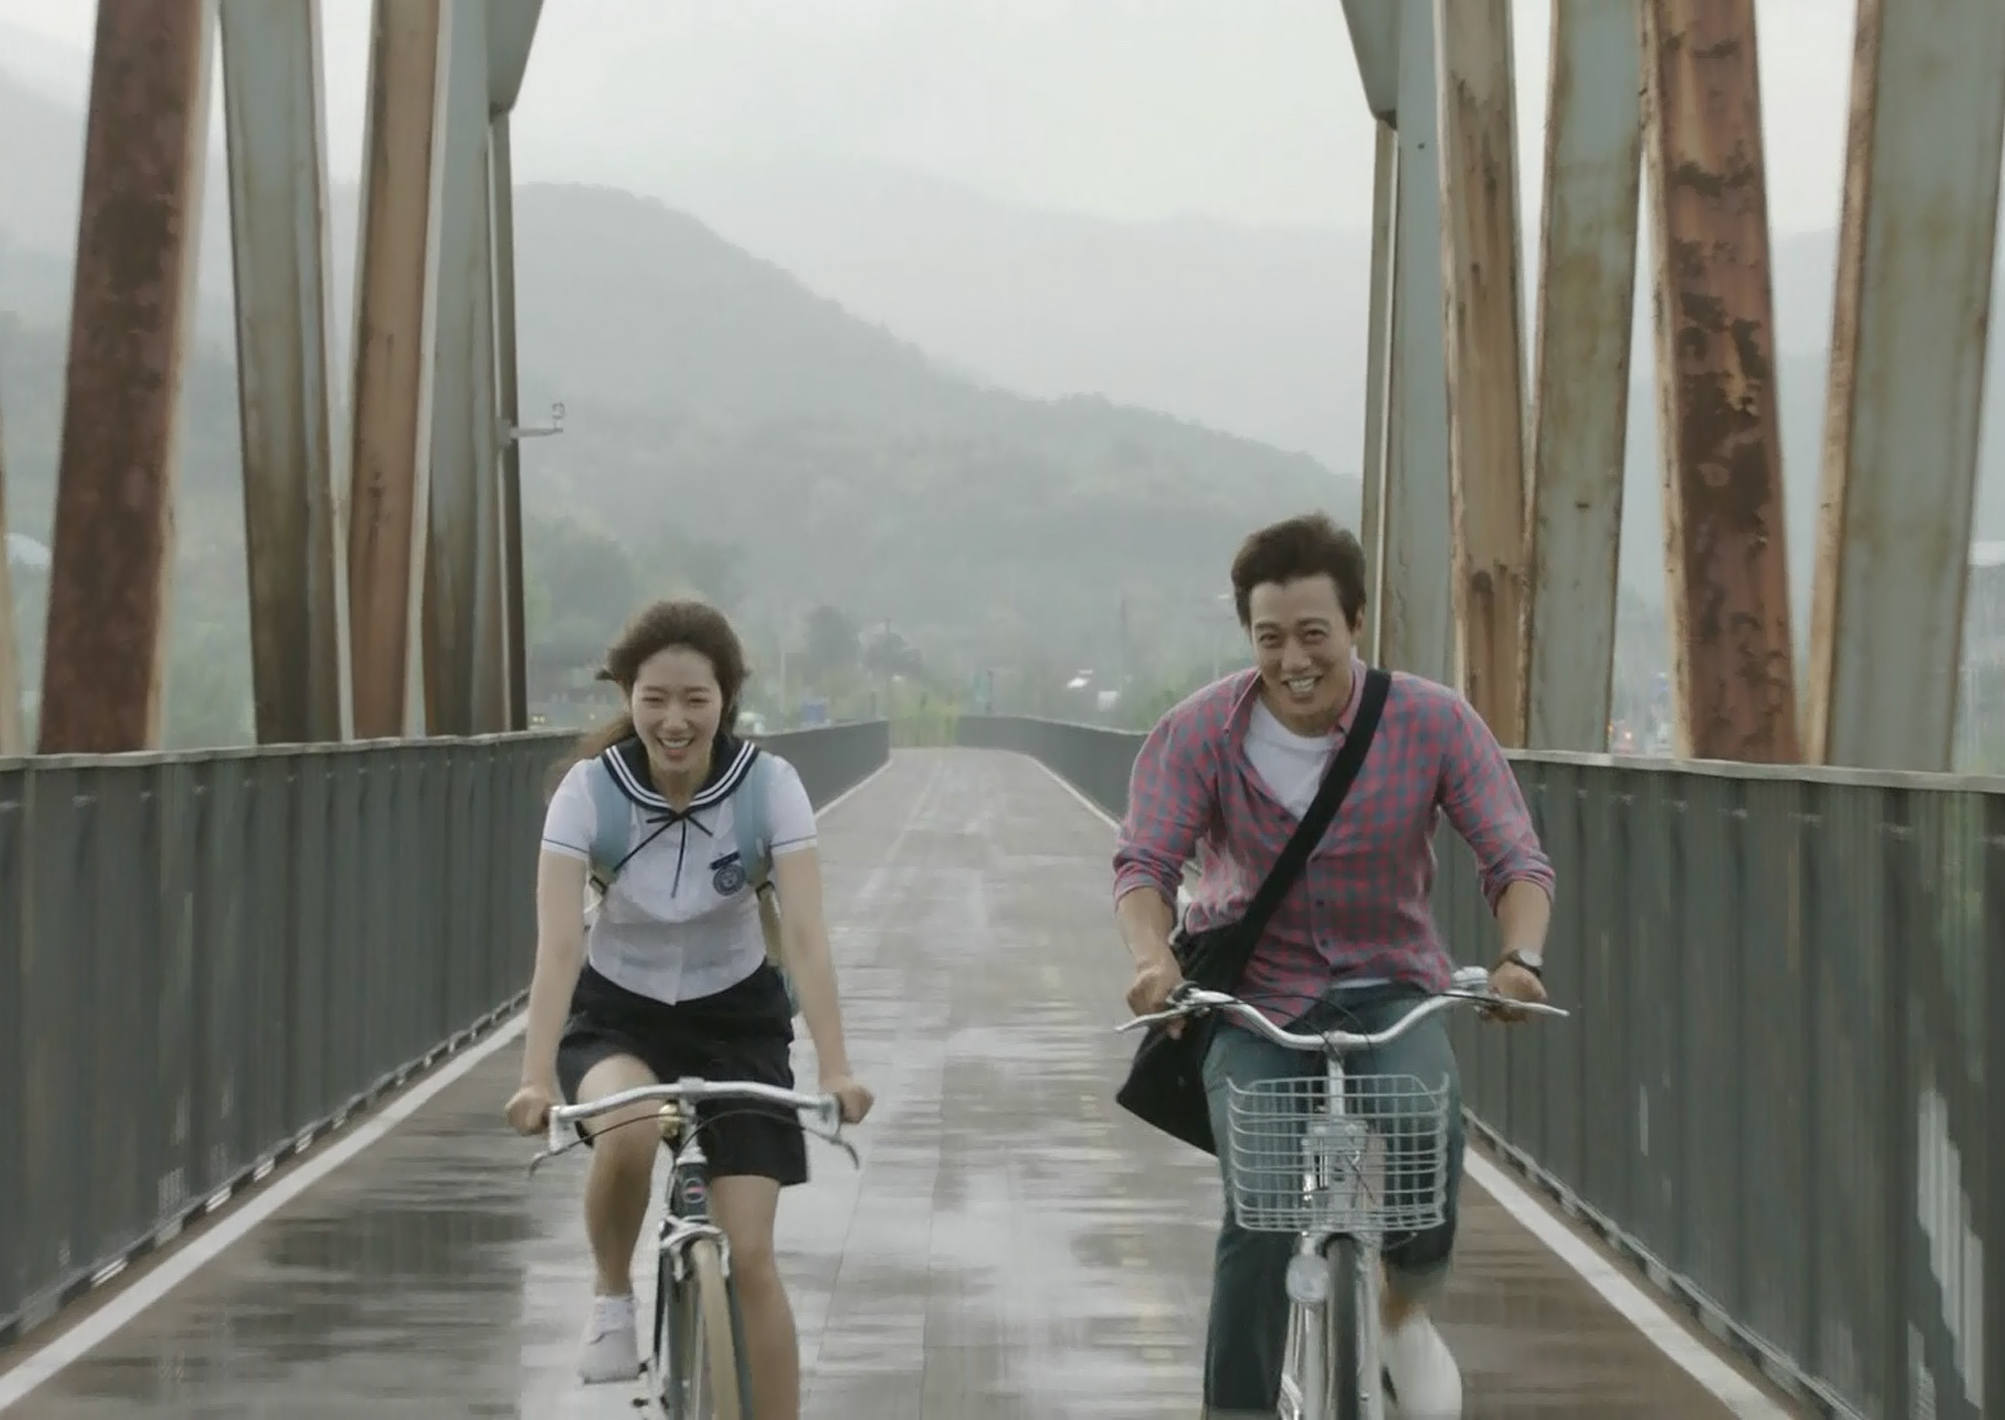 New action-packed Korean drama Doctors may be hotter than DOTS